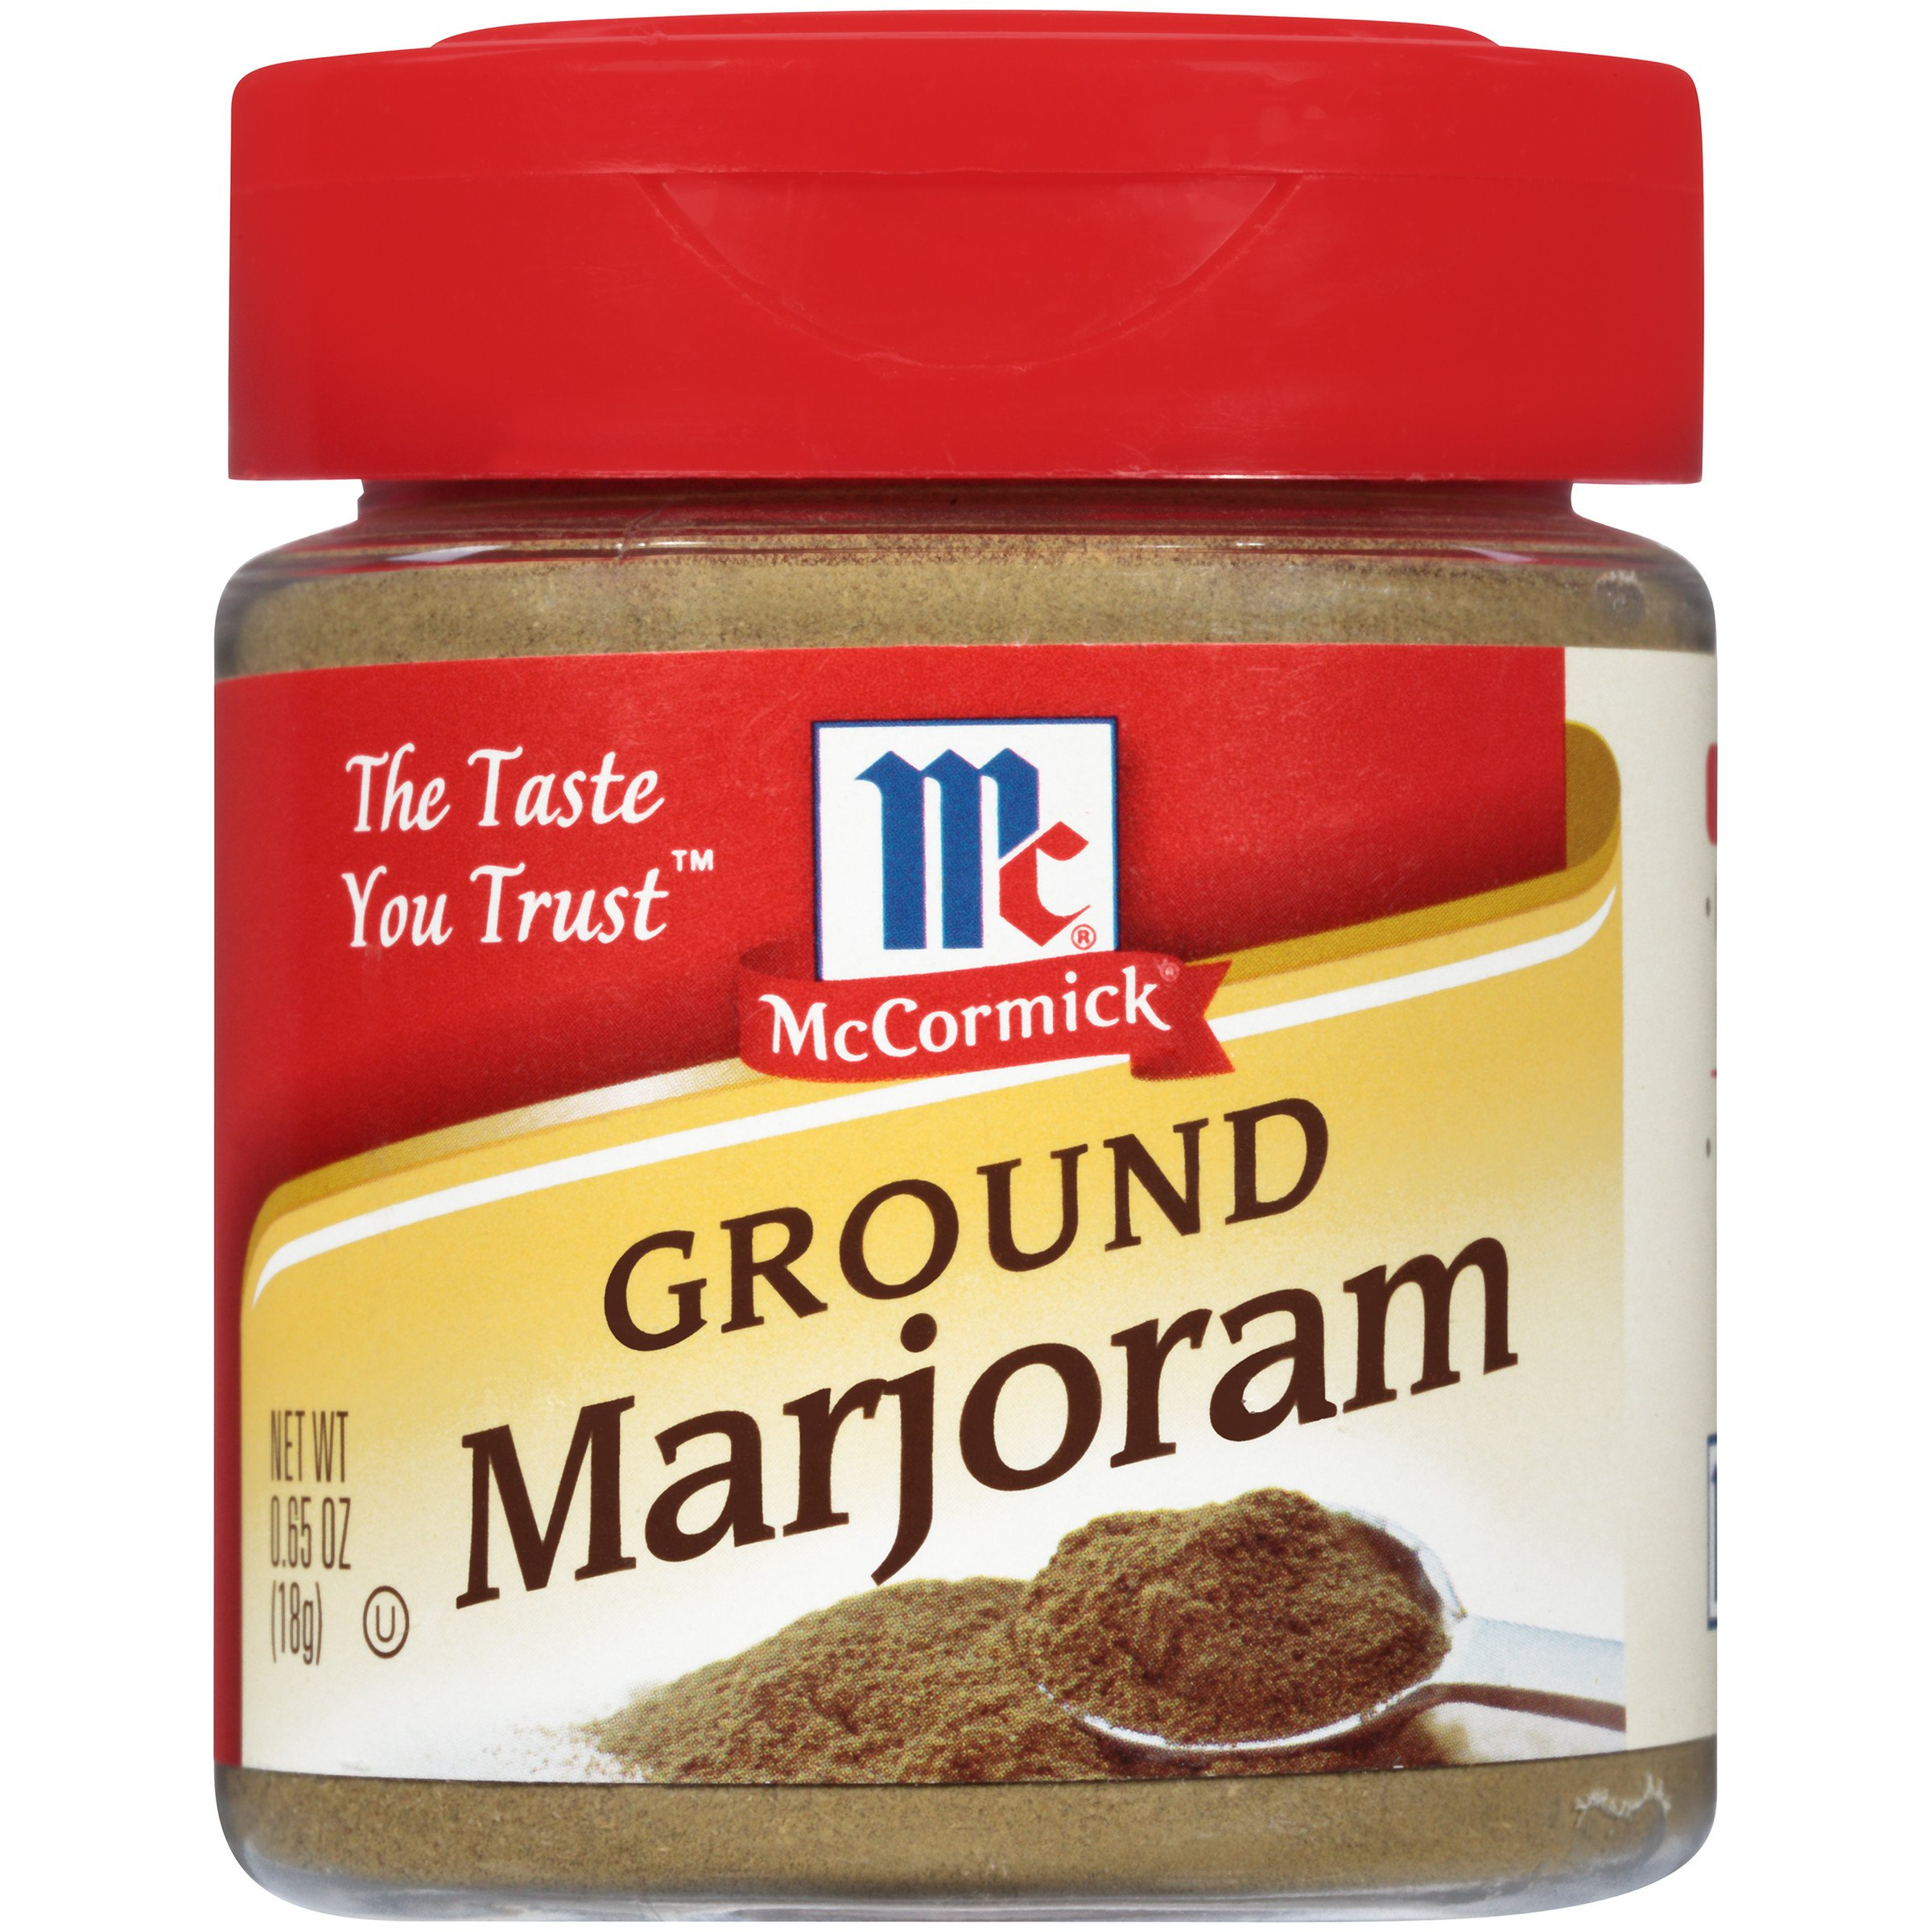 McCormick Ground Marjoram, 0.65 oz